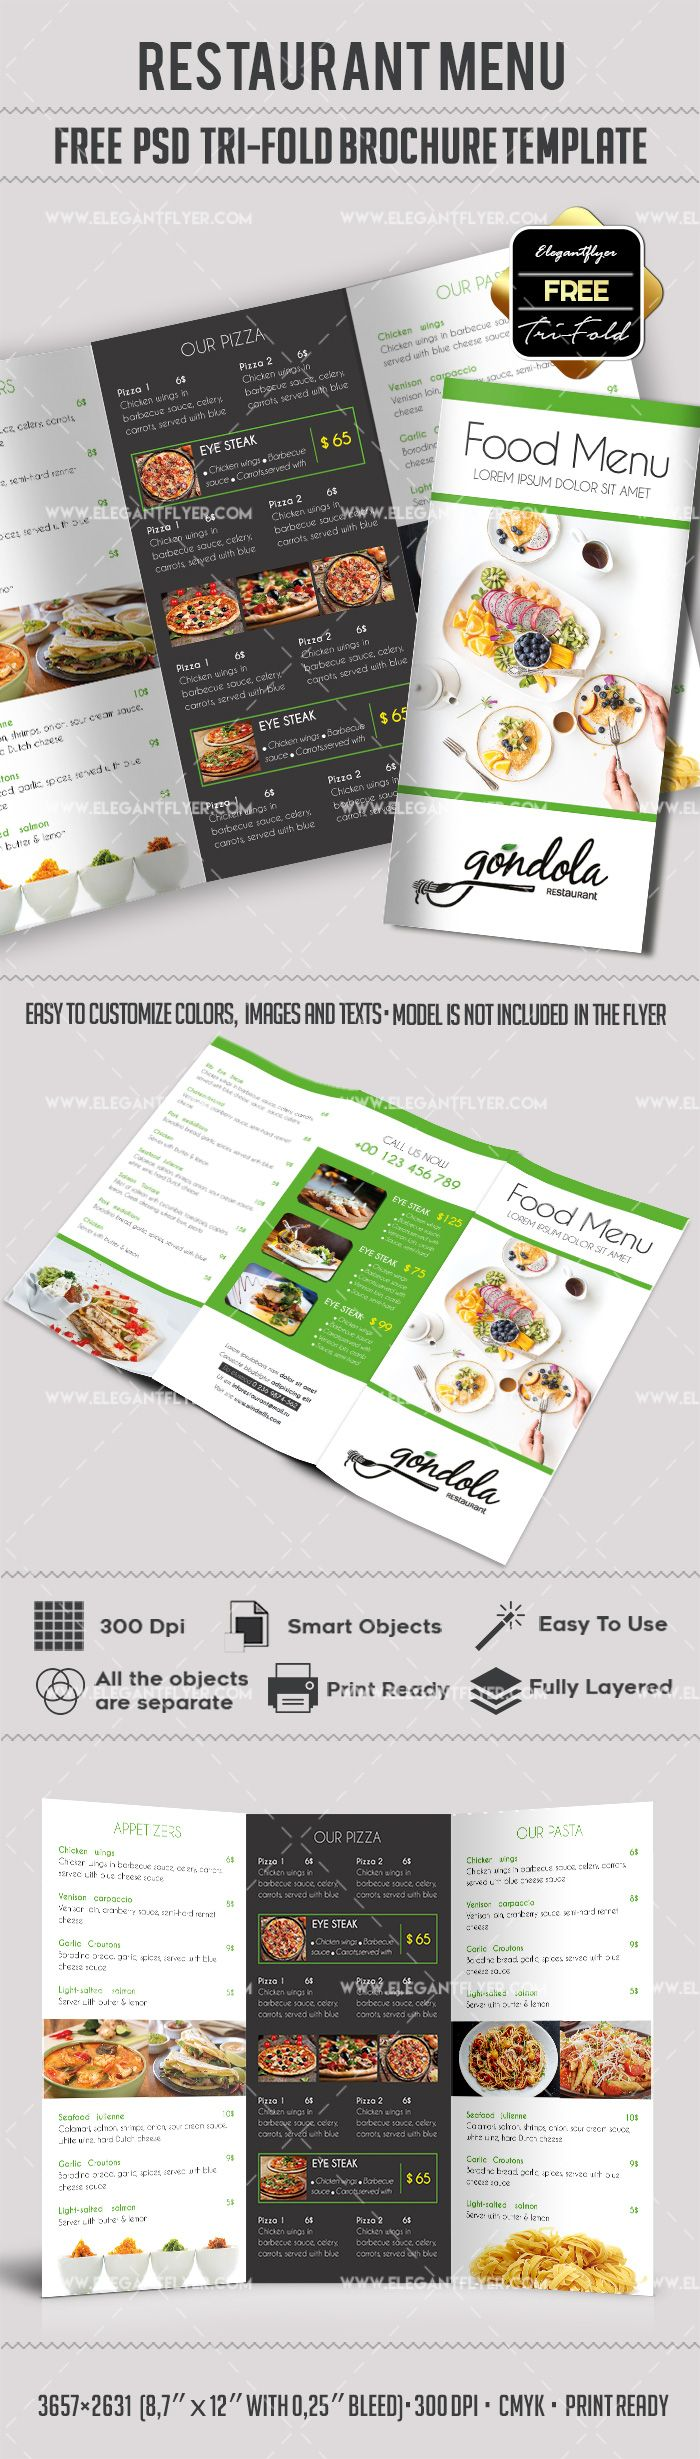 Free Food Menu – Restaurant Brochure Template in PSD